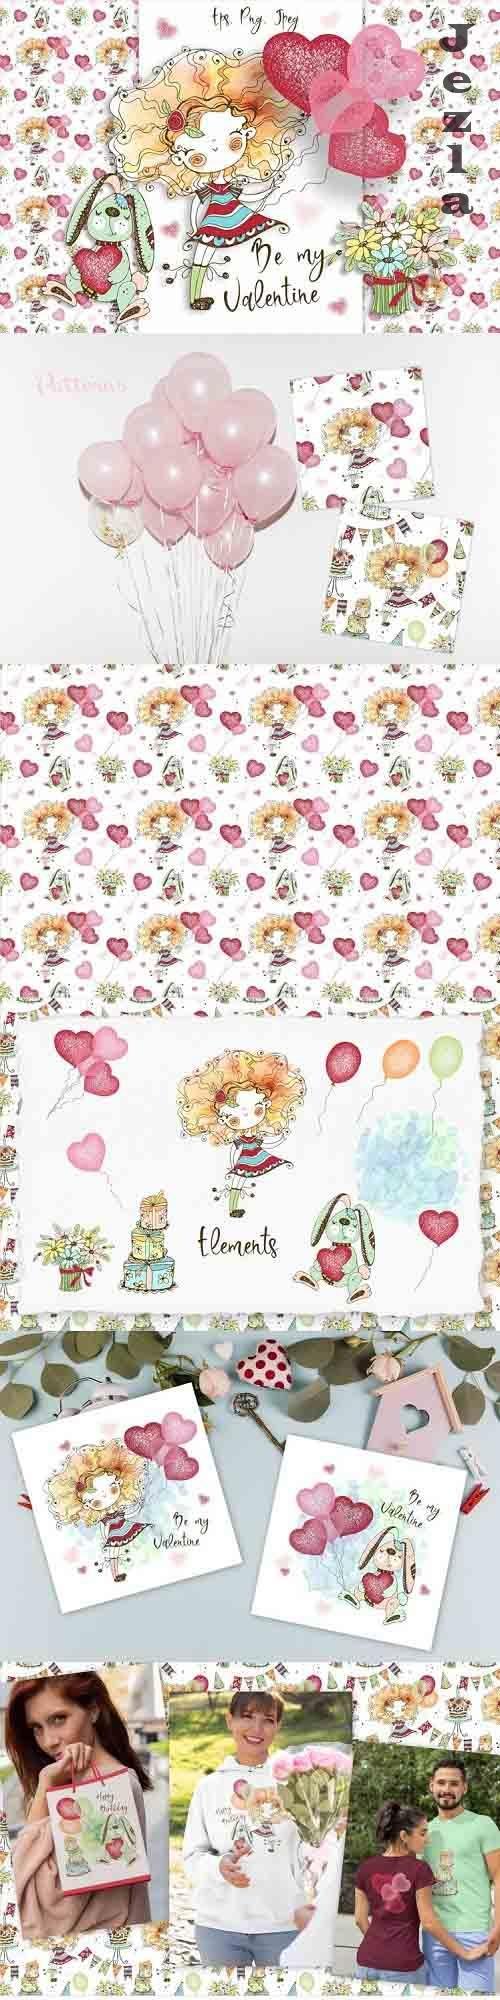 Funny Valentine Cards, Digital Clipart Valentines, Birthday - 1100597